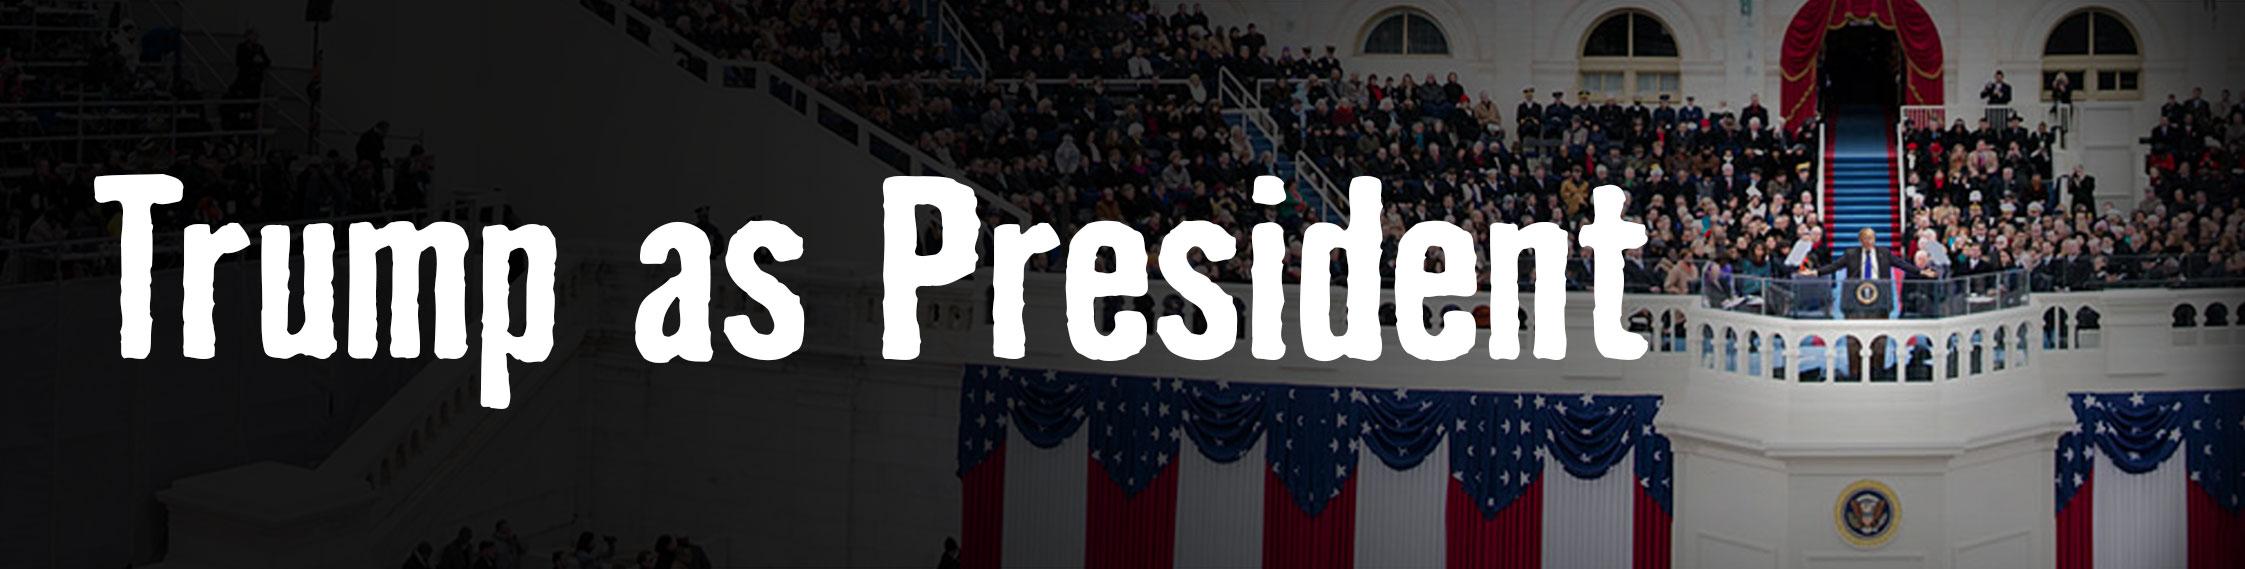 Imagine Donald Trump as President